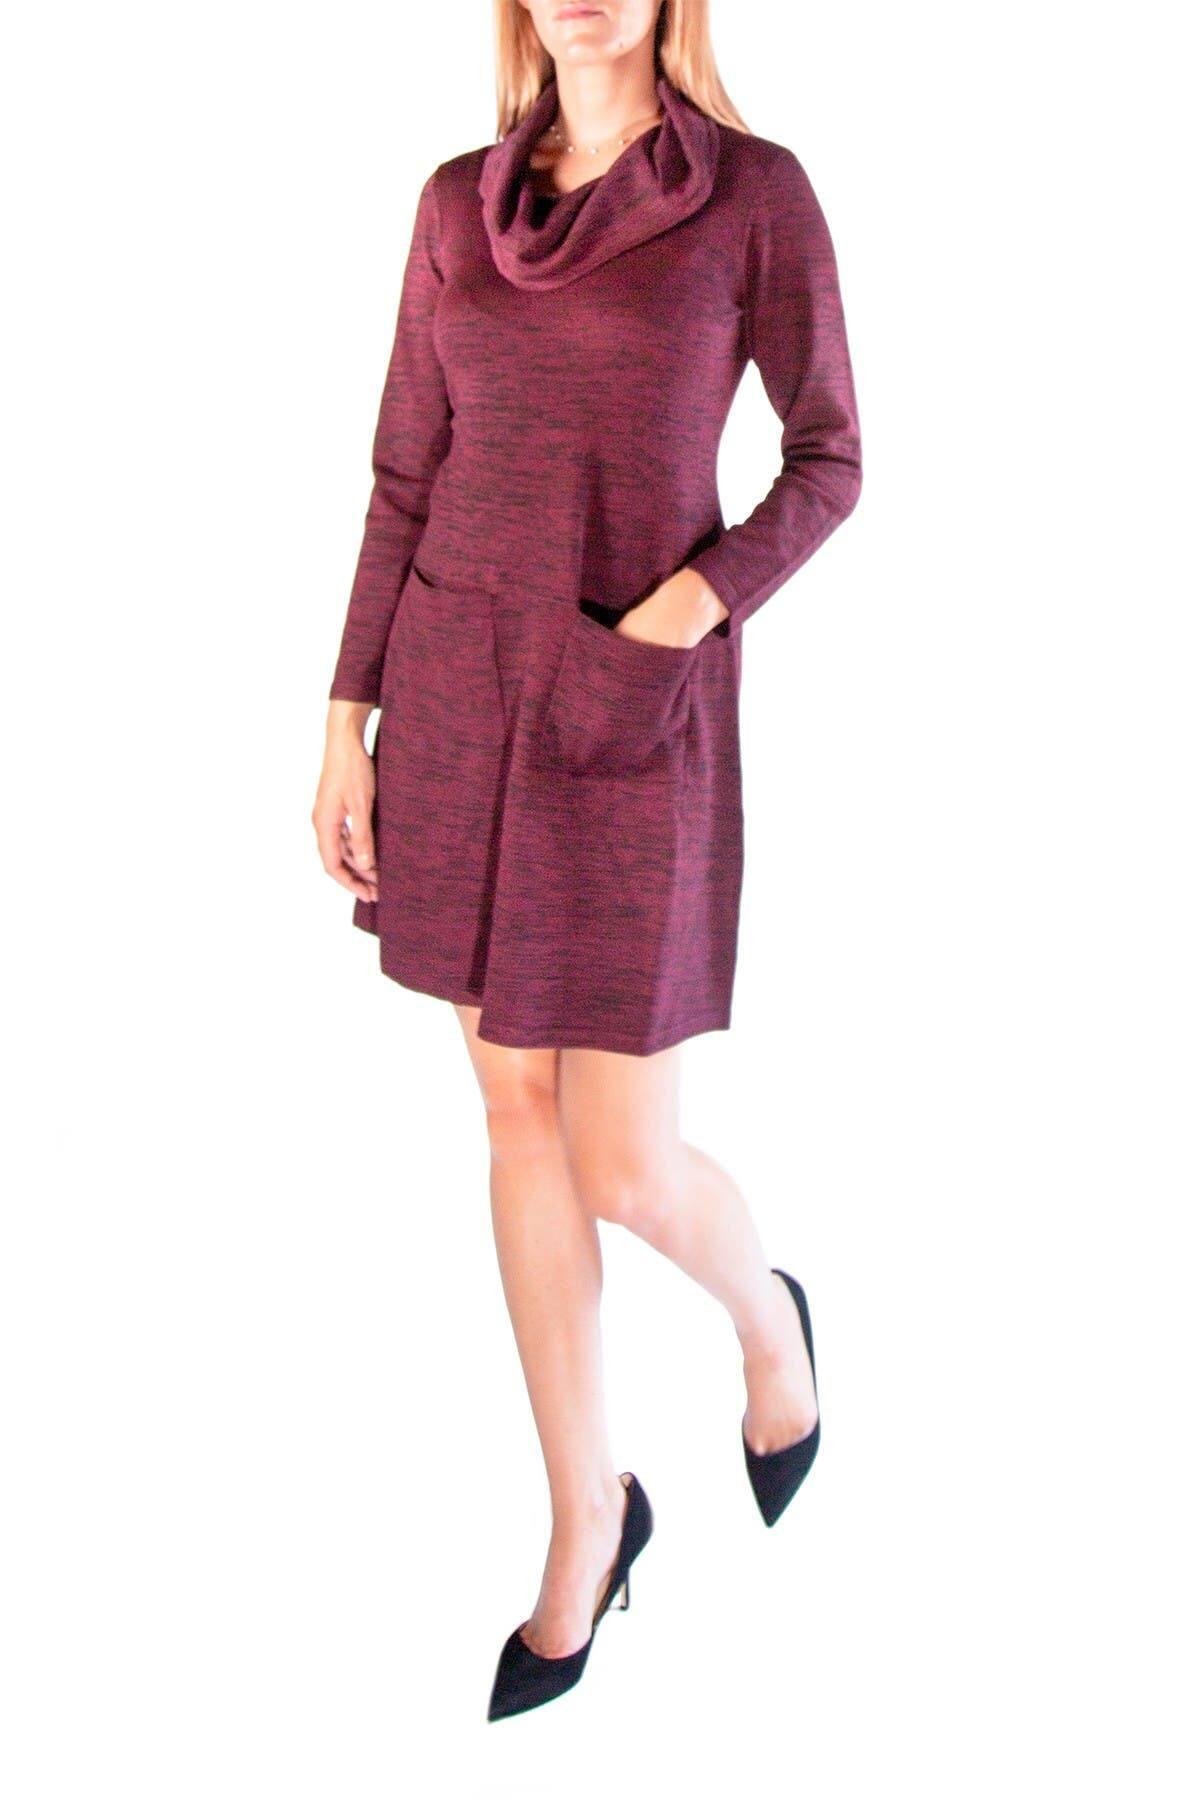 Nina Leonard Women's Cowl Neck Pocket Sweater Dress $5.40 & More + Free Store Pickup at Nordstrom Rack